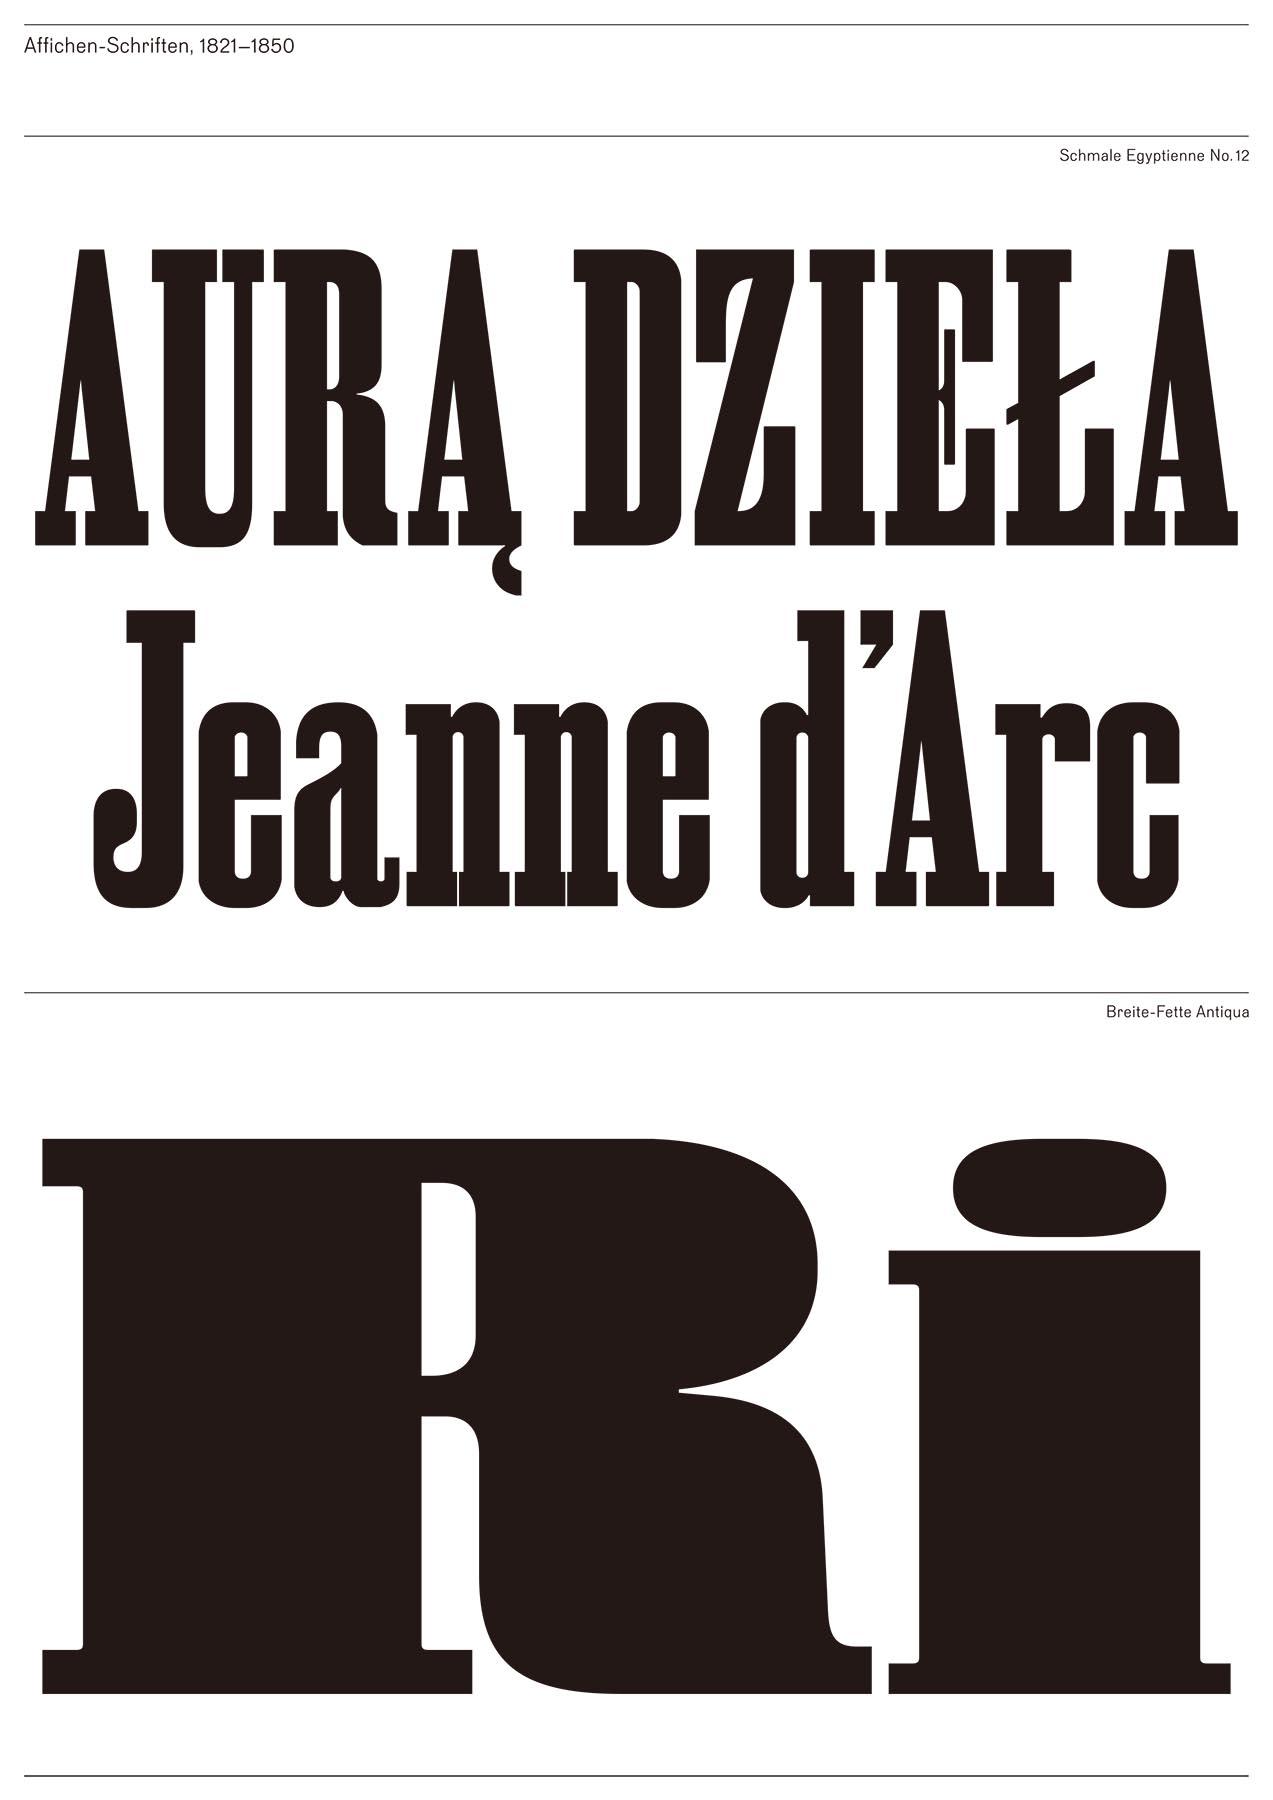 Pierre Pané-Farré|Affichen-Schriften FSL